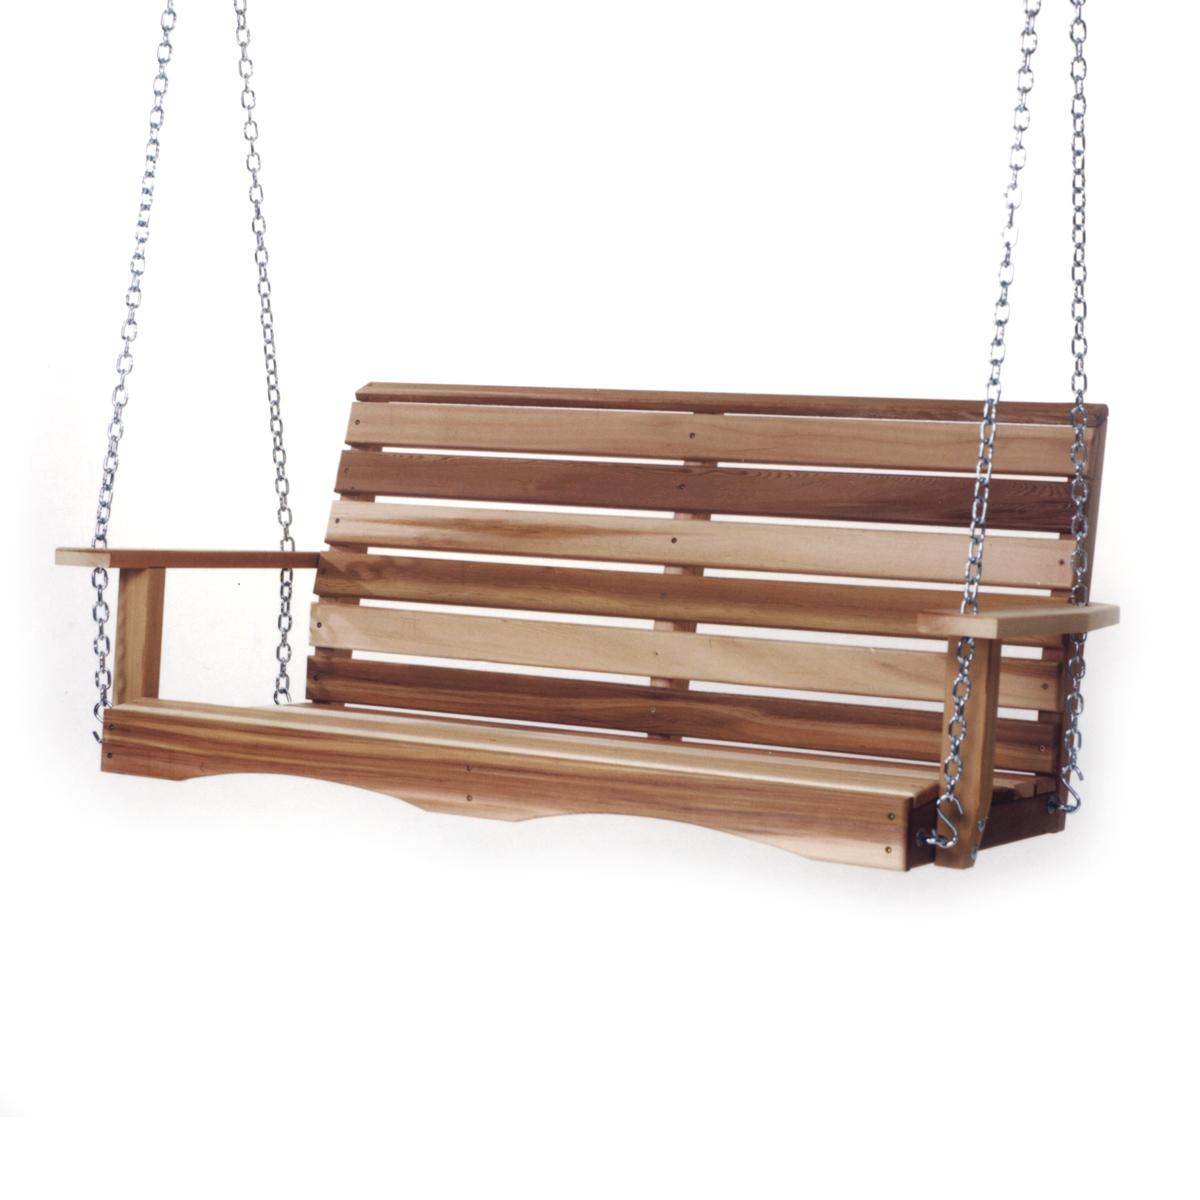 All Things Cedar Patio Furniture Adirondack Chairs Porch Regarding 5 Ft Cedar Swings With Springs (View 7 of 25)